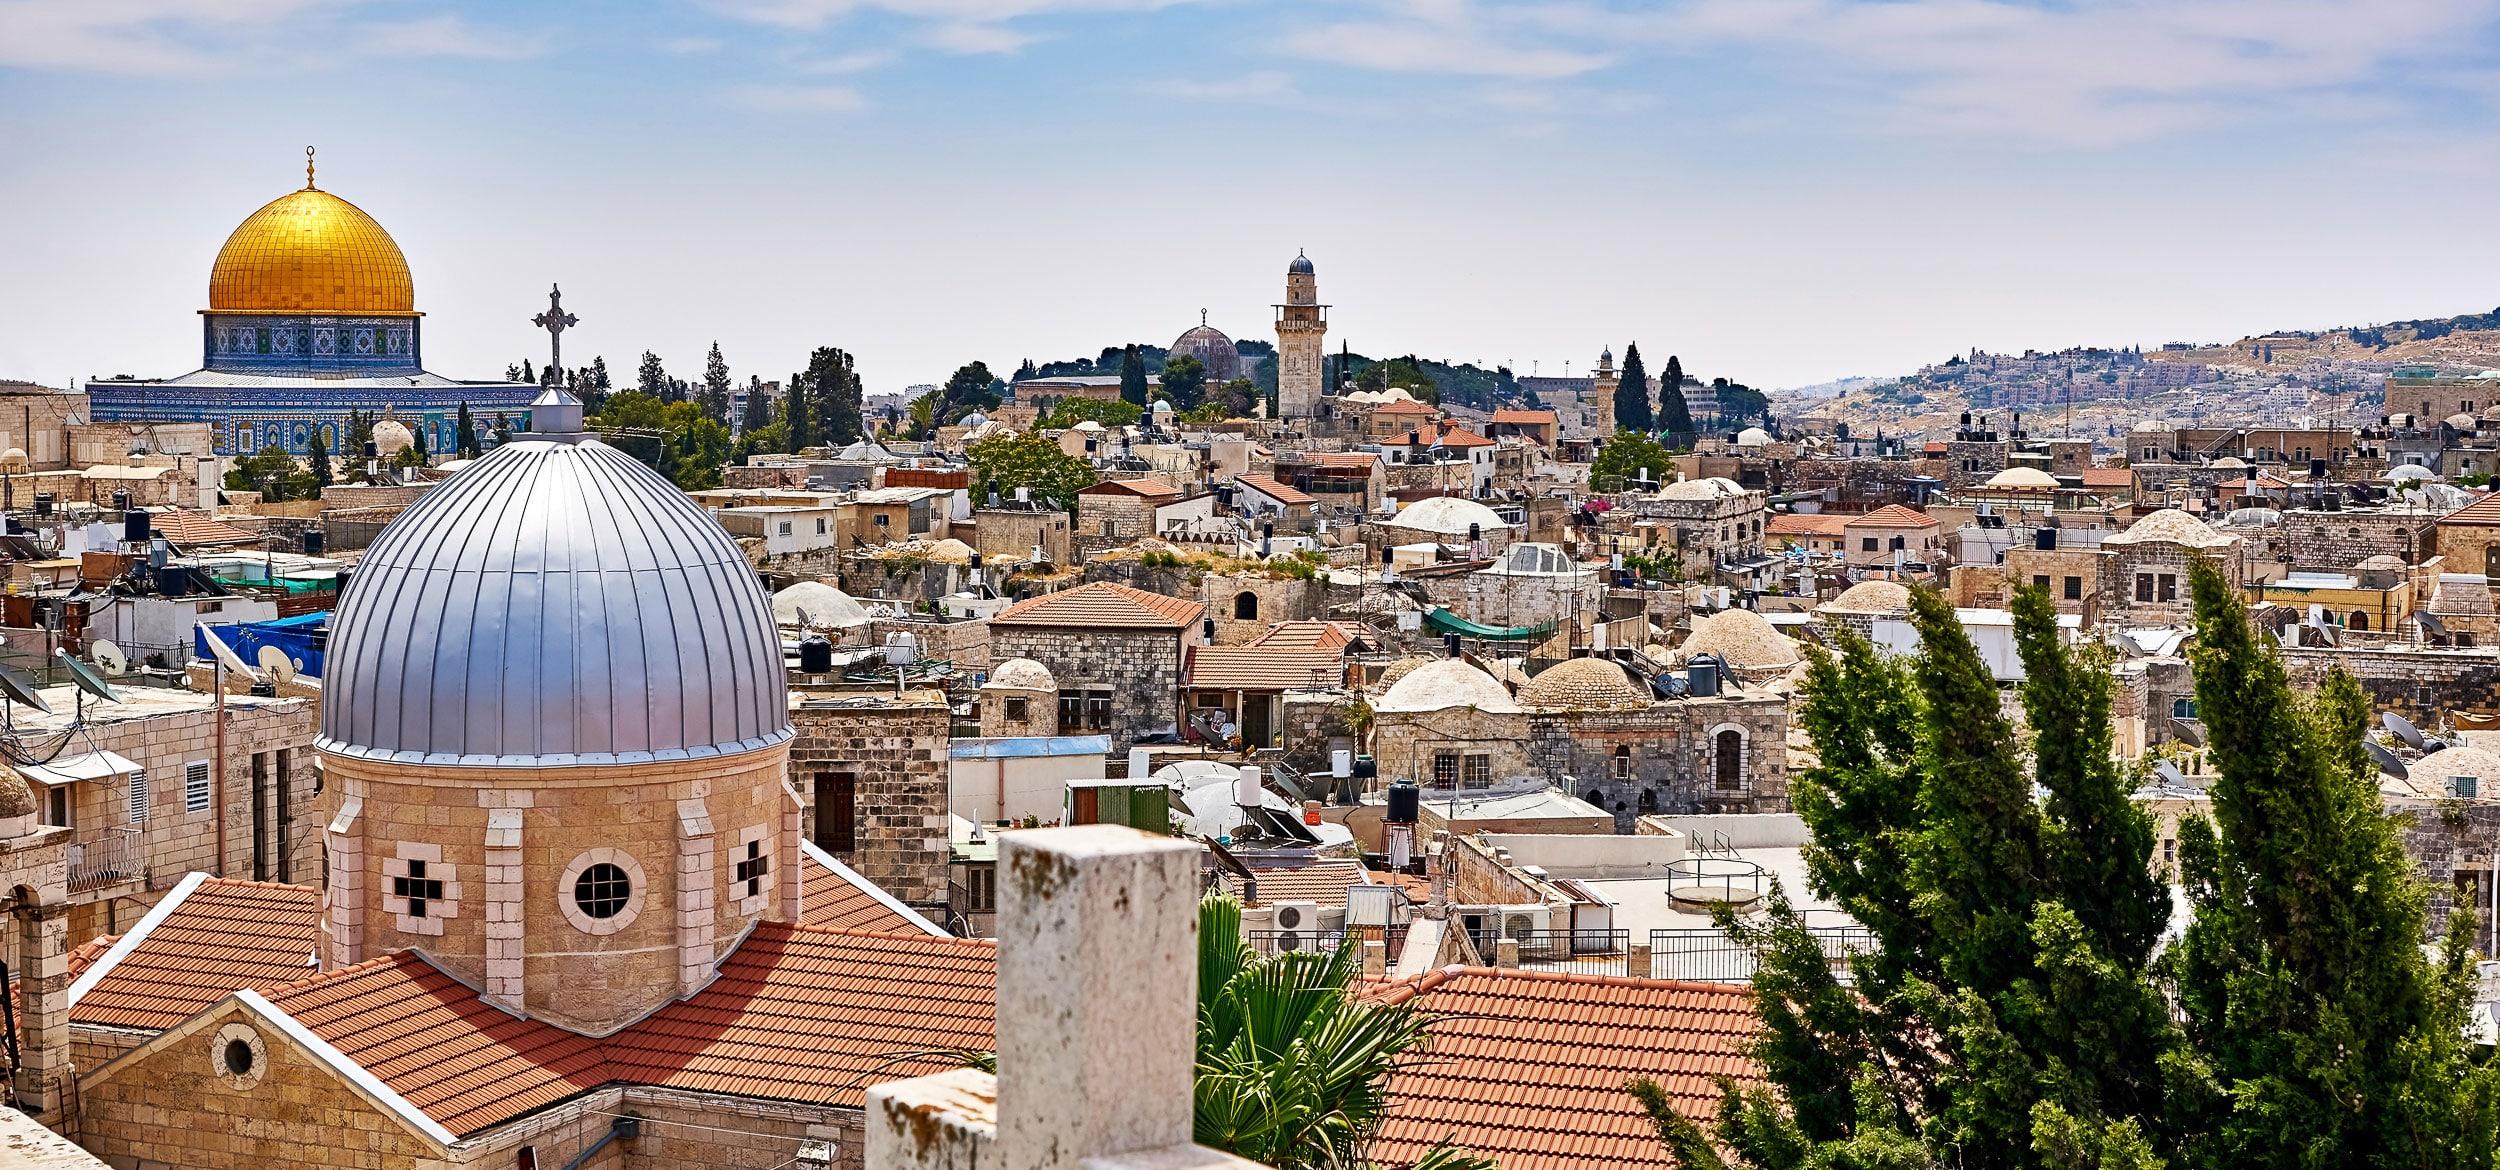 University of Haifa: Haifa - Summer Courses, Internships, Intensive Hebrew & Arabic